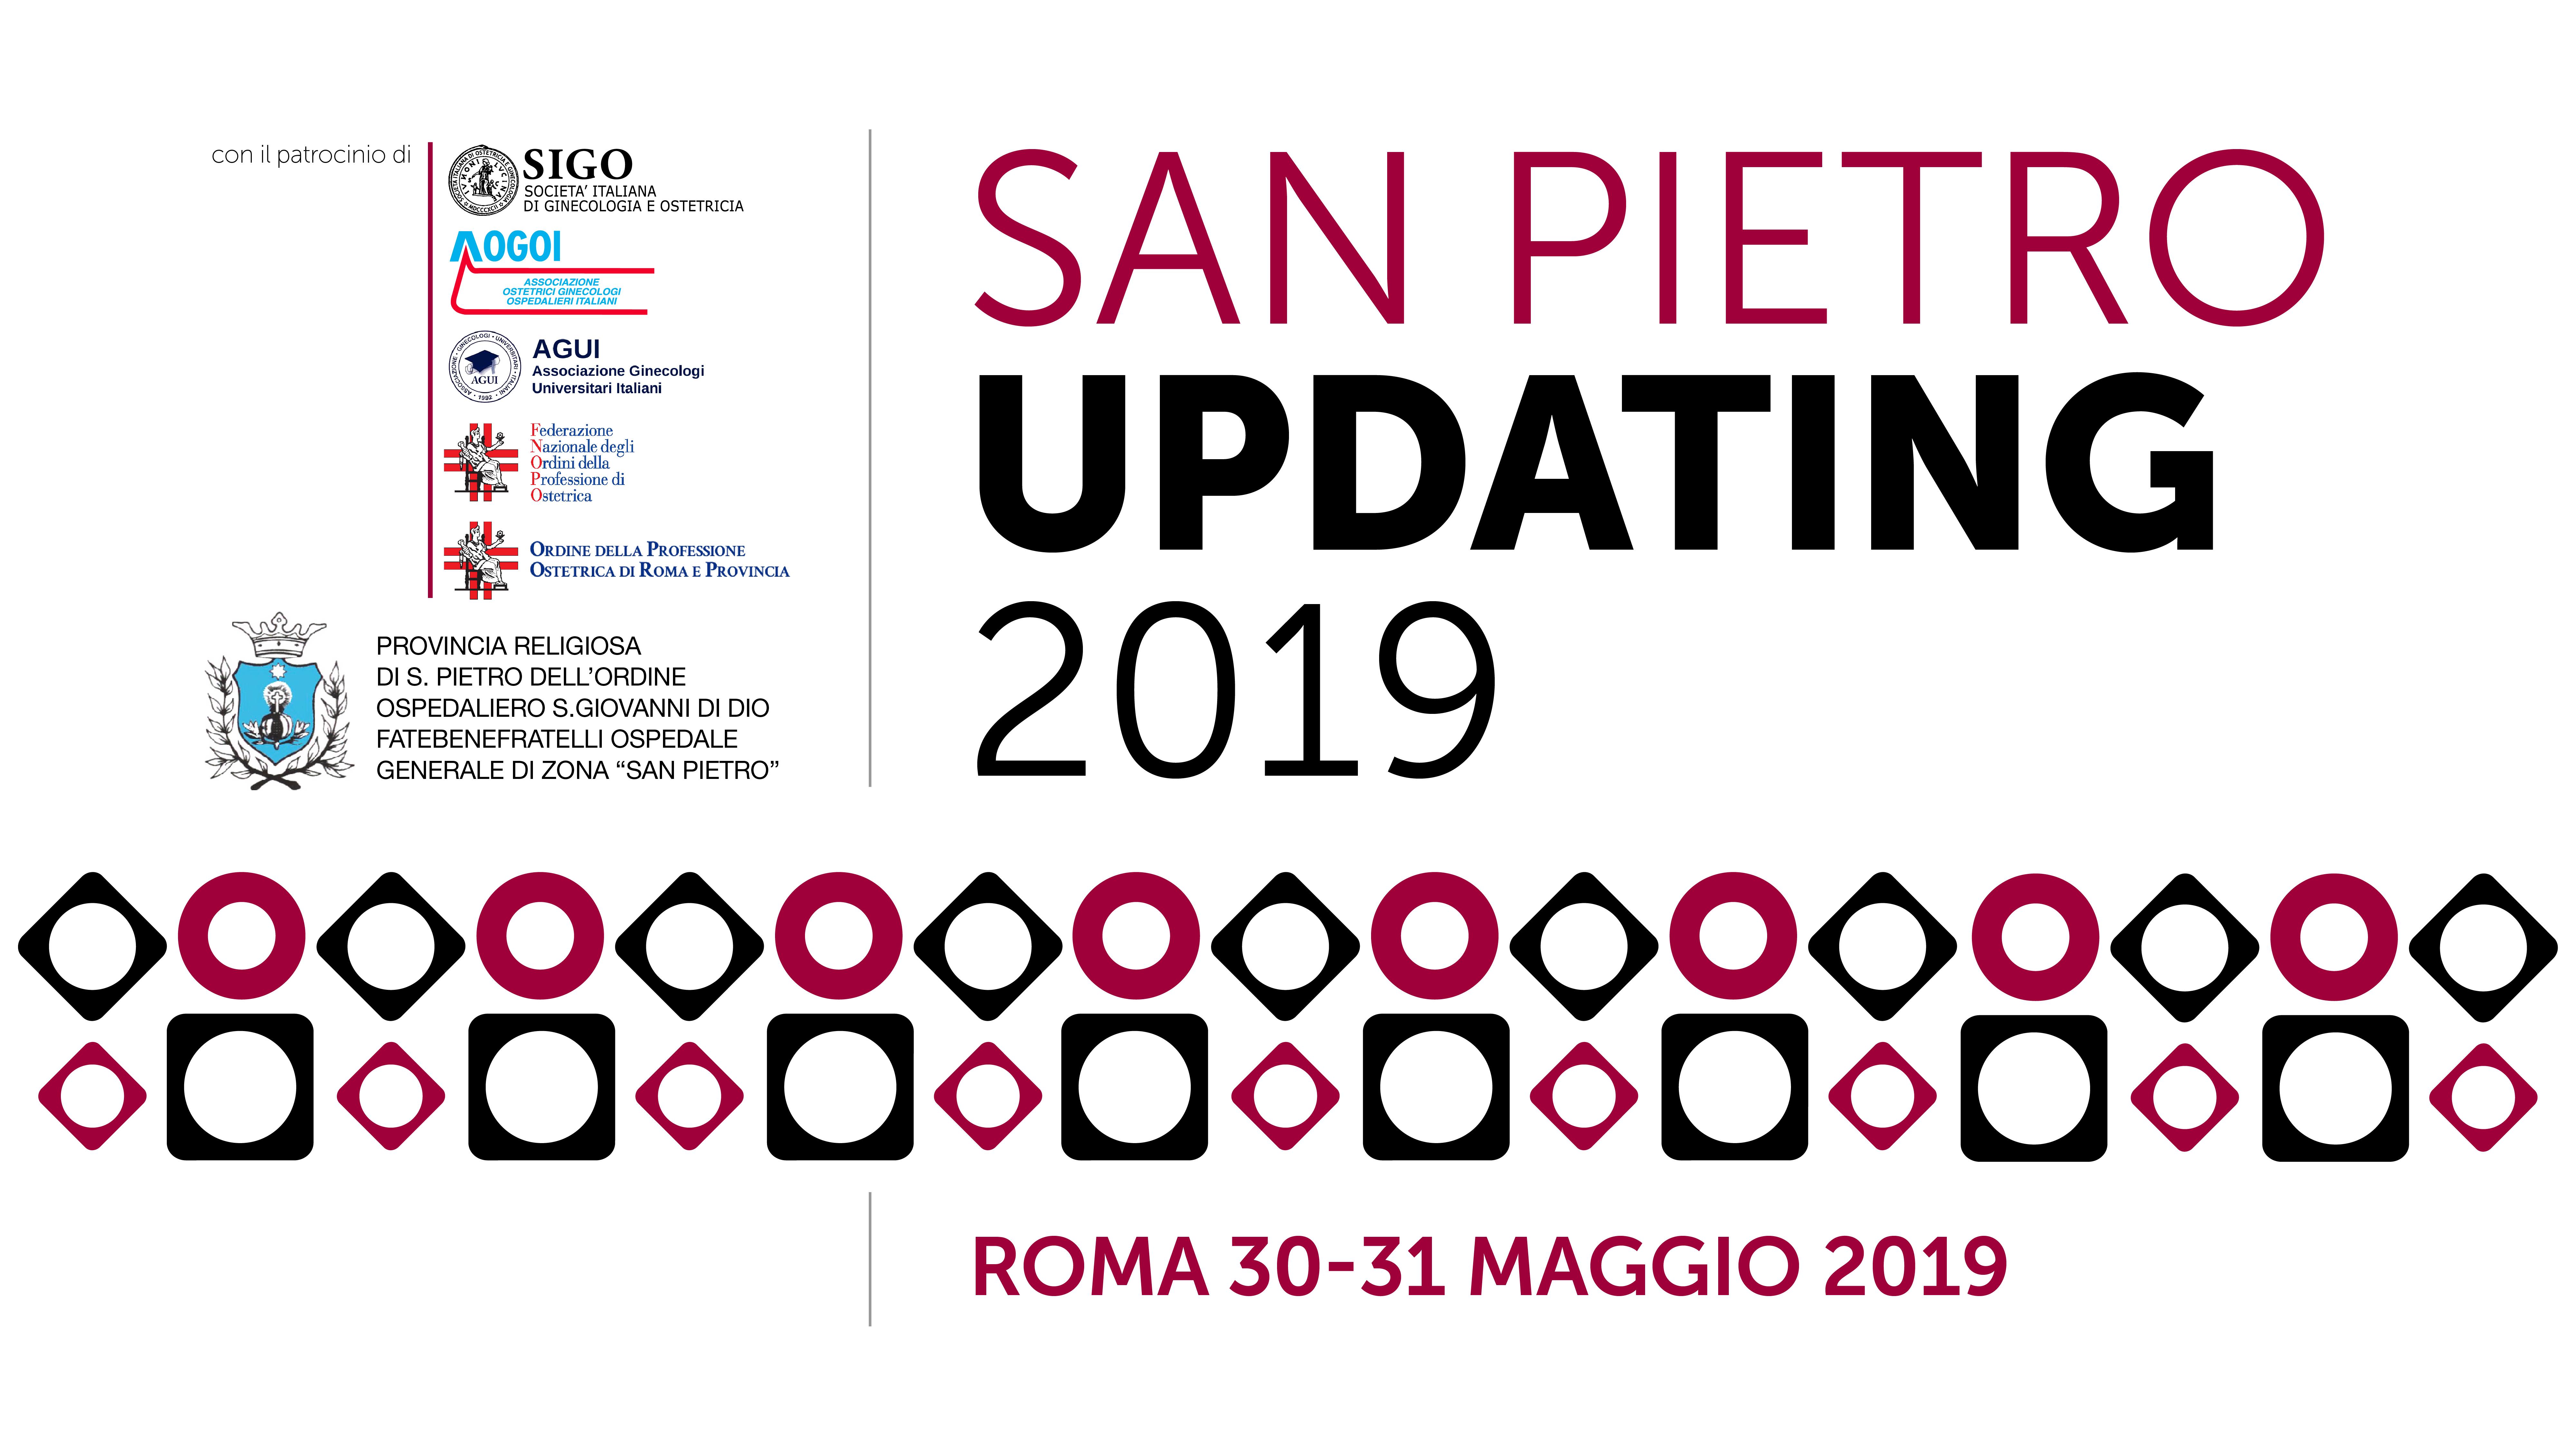 San Pietro Updating 2019